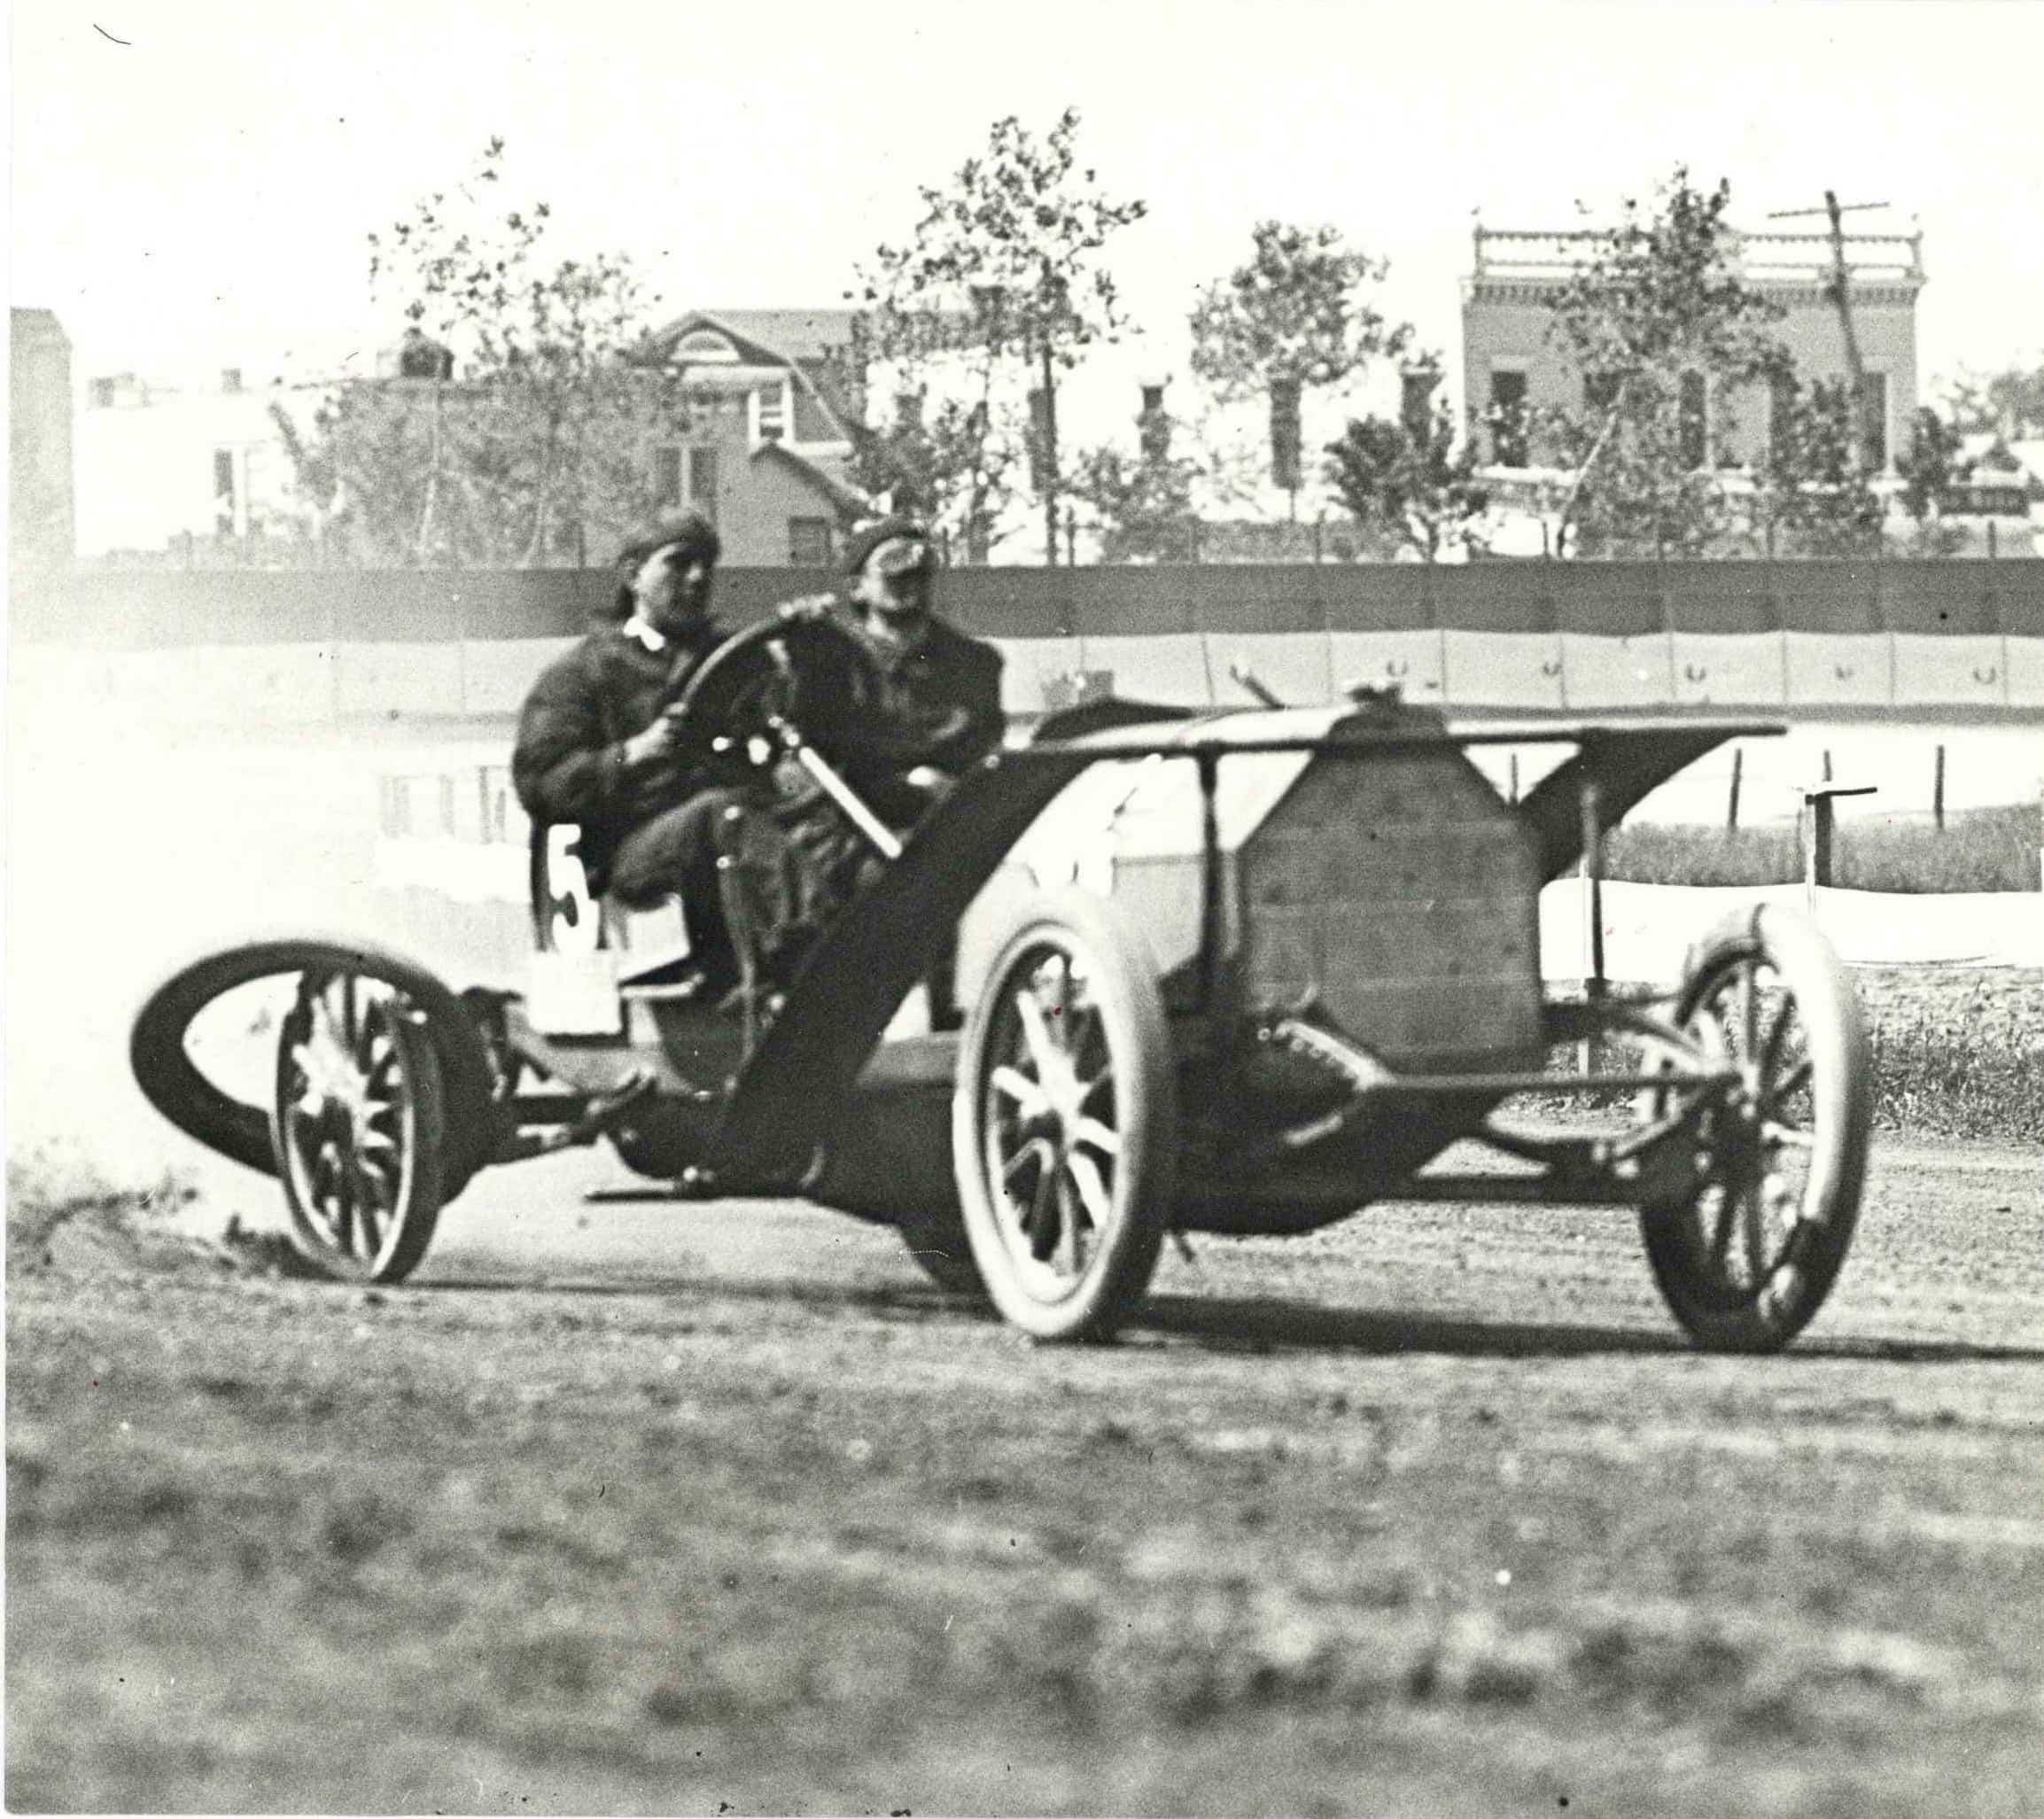 1910 ca. PIERCE-ARROW race car losing tire - Chuck's Toyland